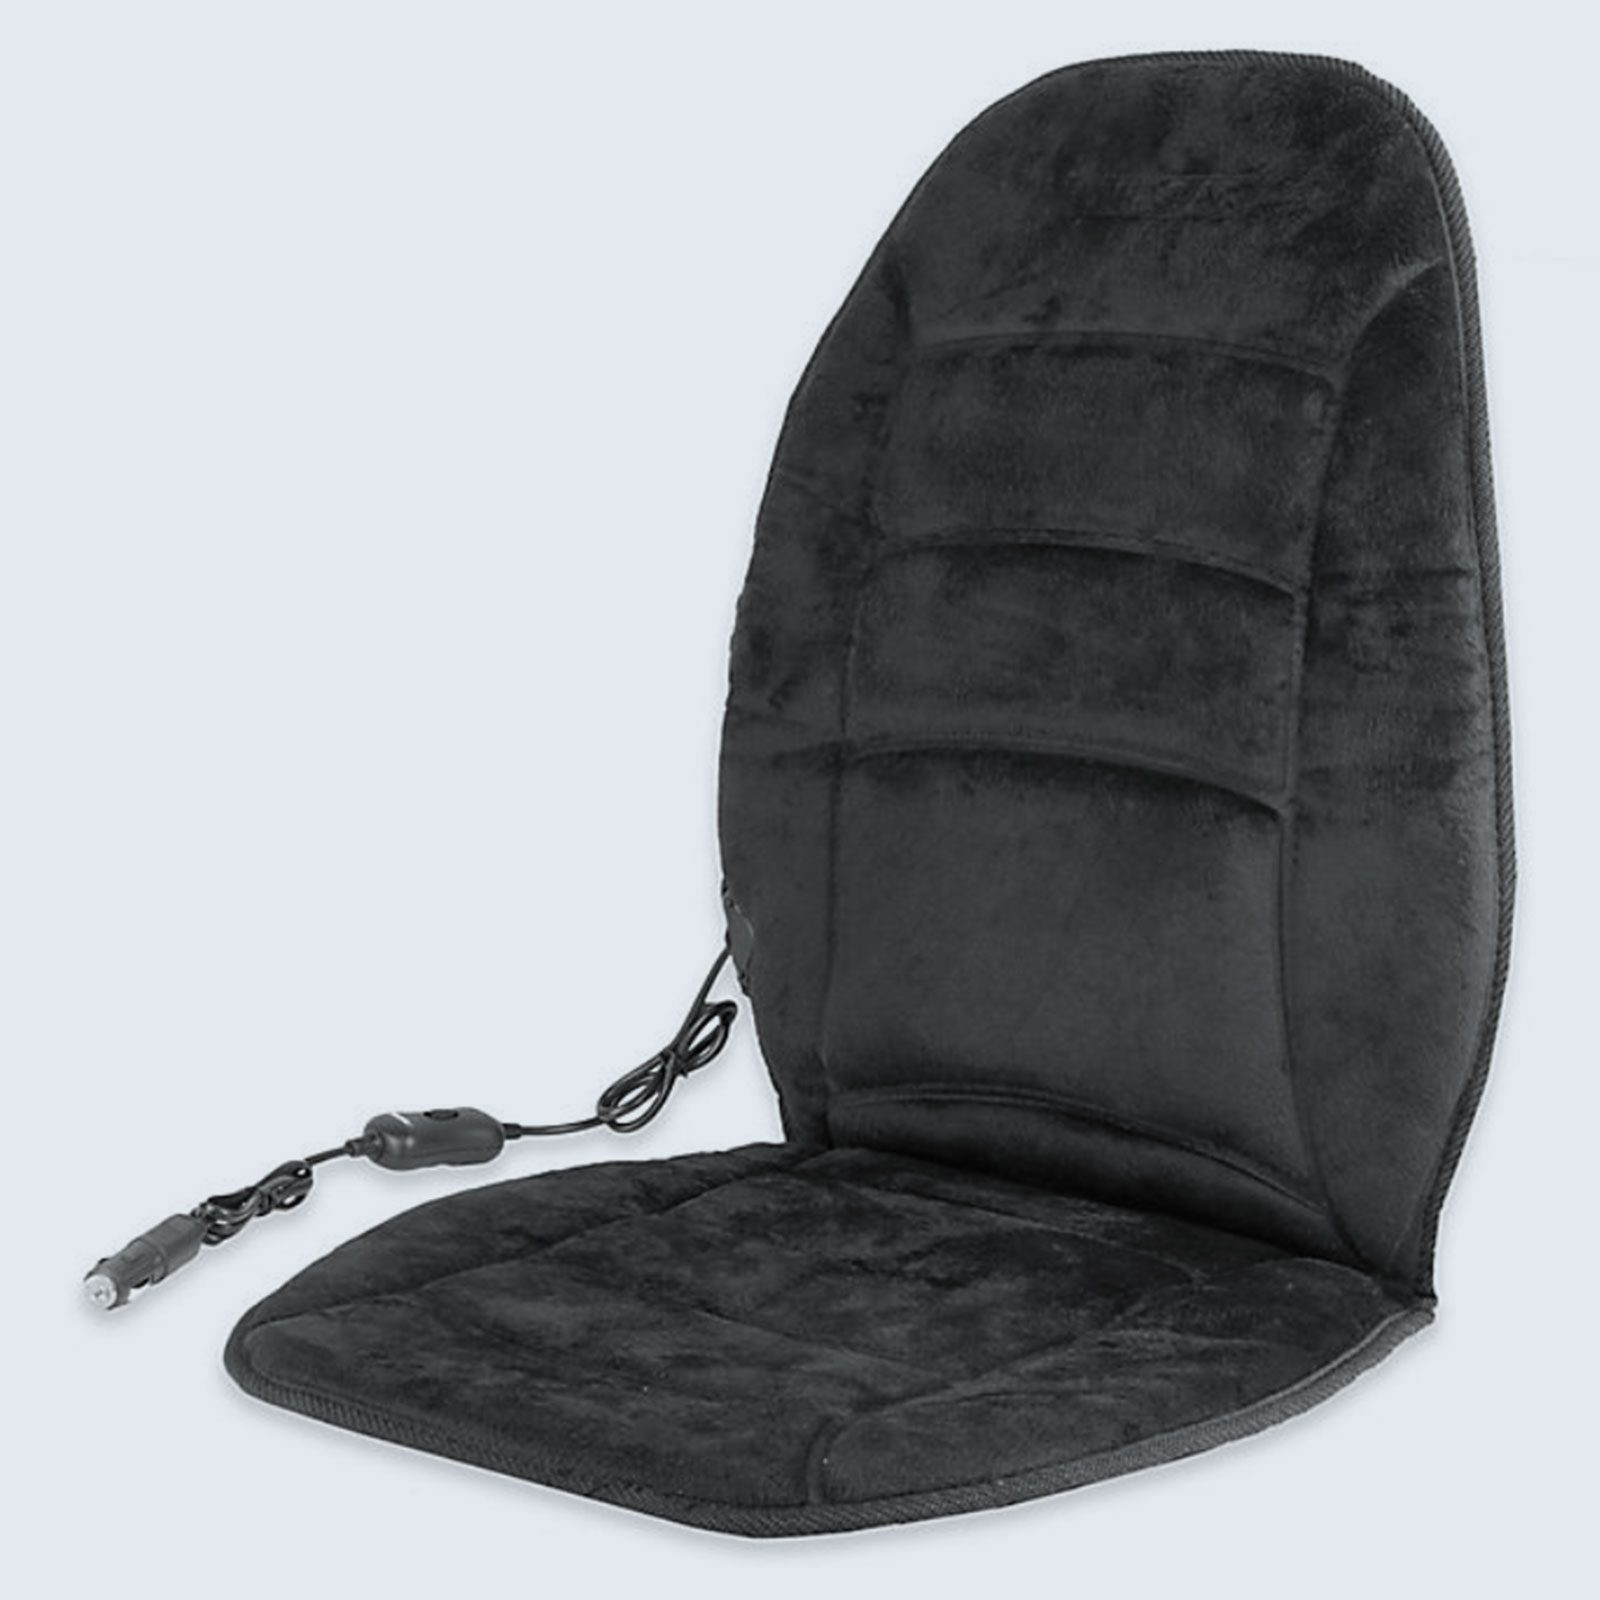 Wagan Deluxe Velour Heated Seat Cushion